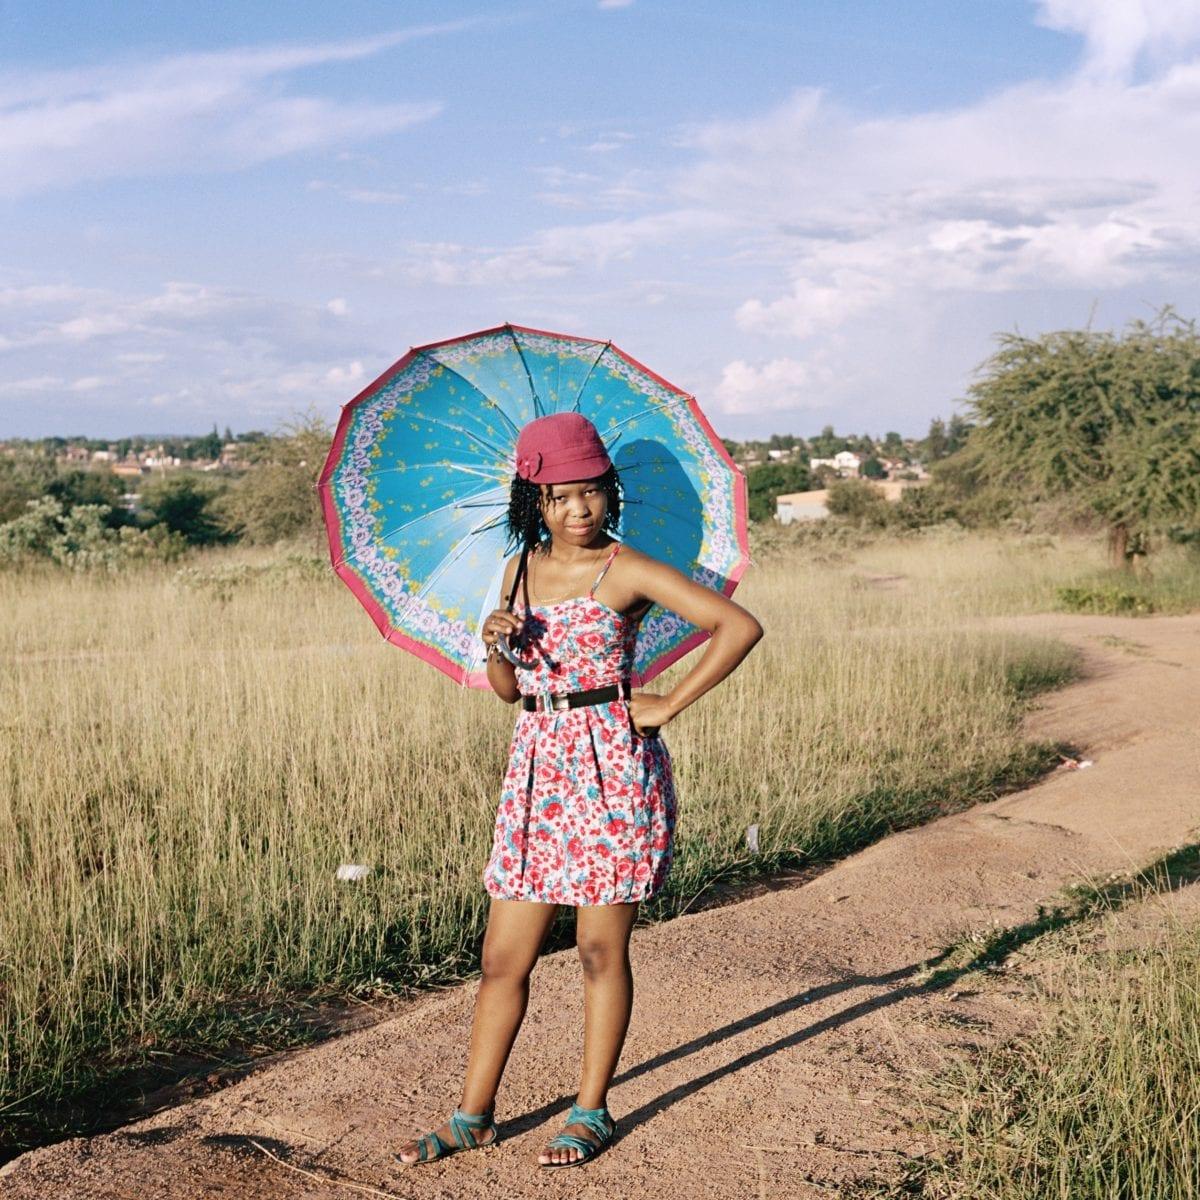 Homeland, Thembi Mathebulaor Nzimande, Siyabuswa, former Kwandebele, 2009. All images courtesy the artist and Goodman Gallery